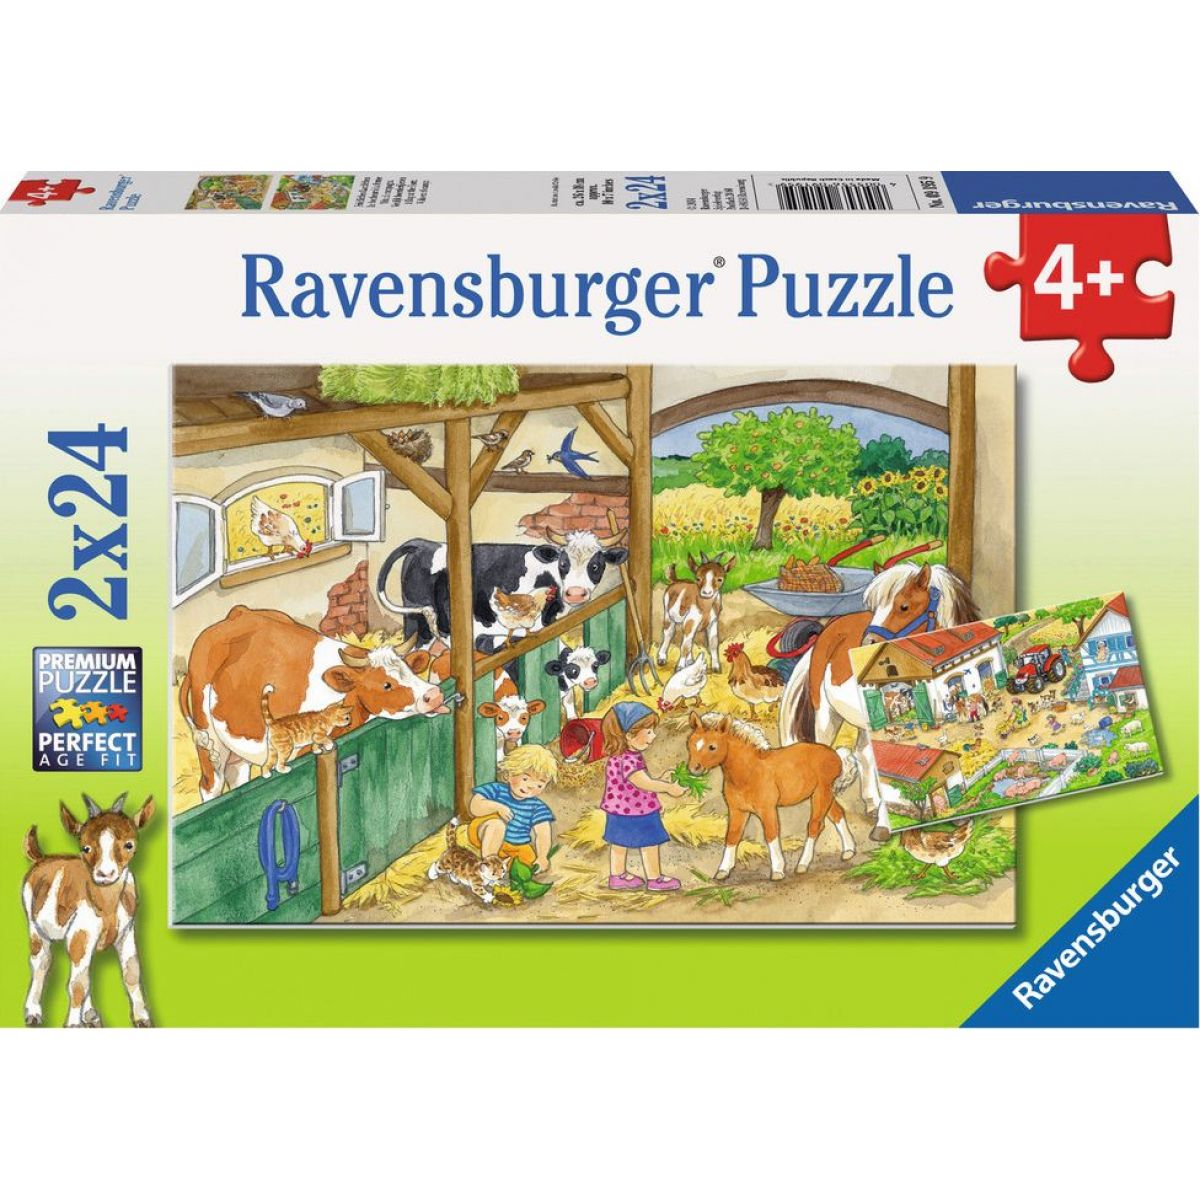 Ravensburger Radostný život na venkově 2 x 24 dílků